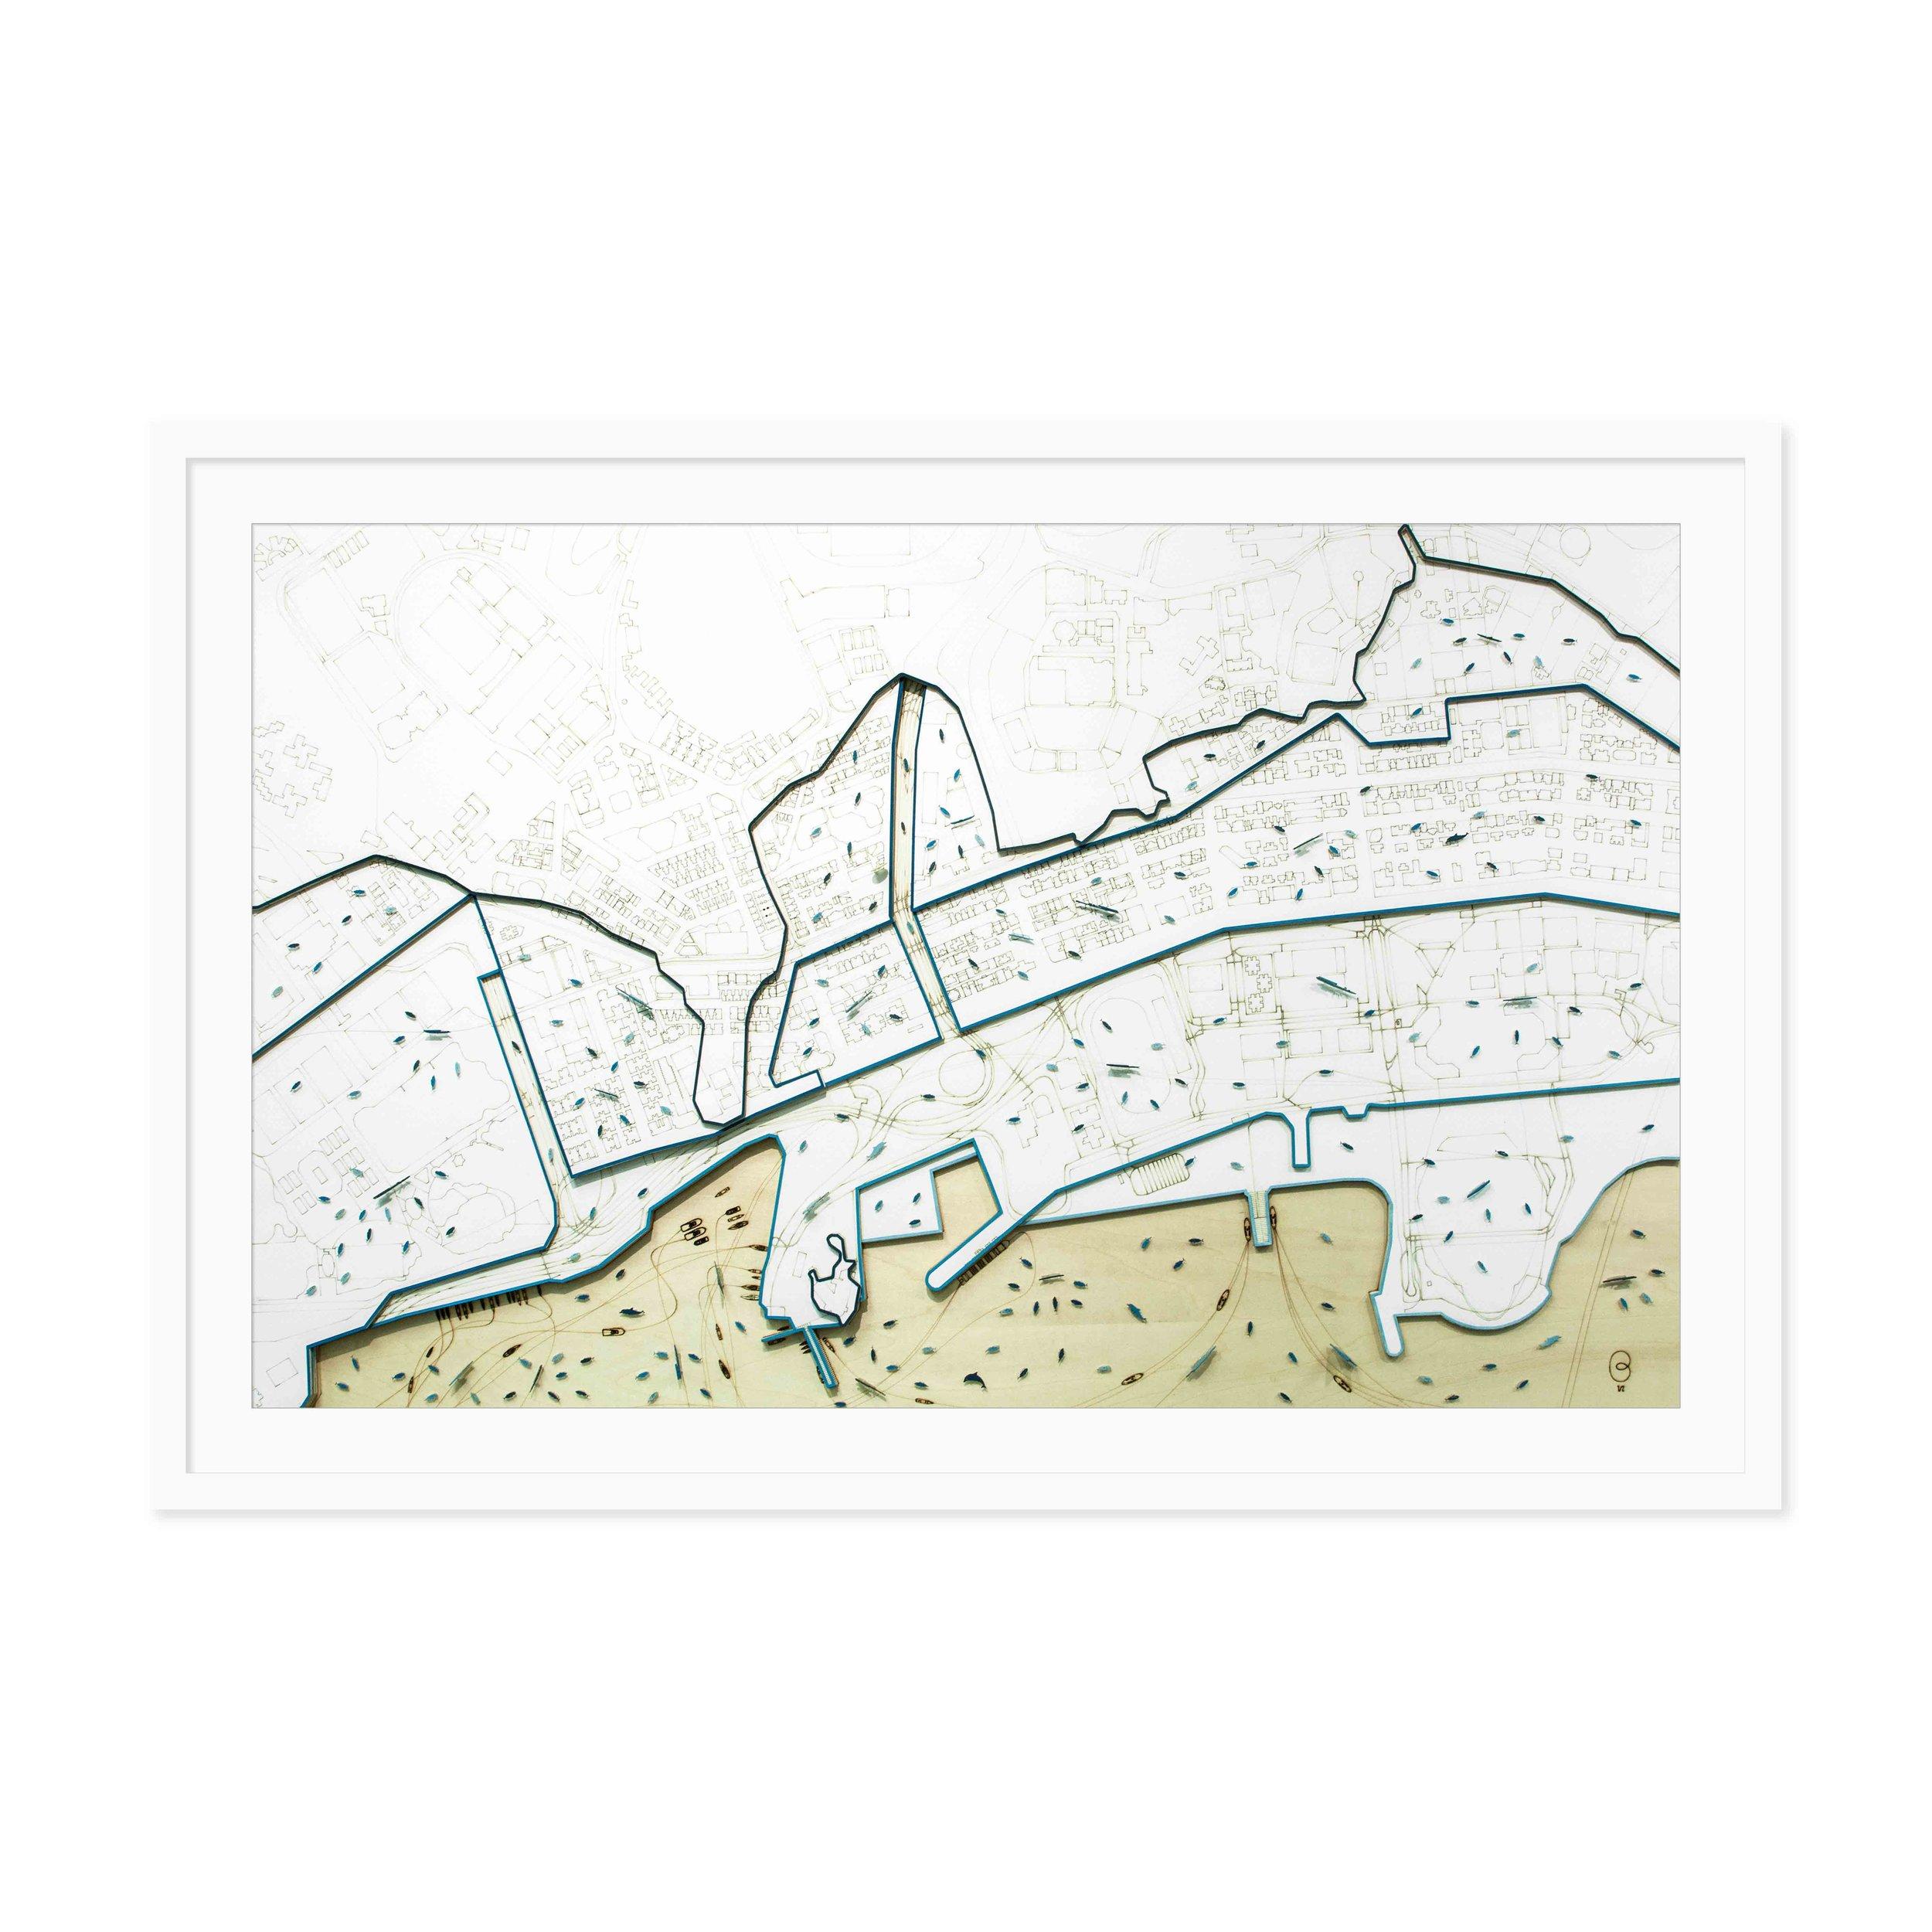 Bean Buro_The Work Project_Hong Kong Coastline_Lasercut drawing_01.jpg